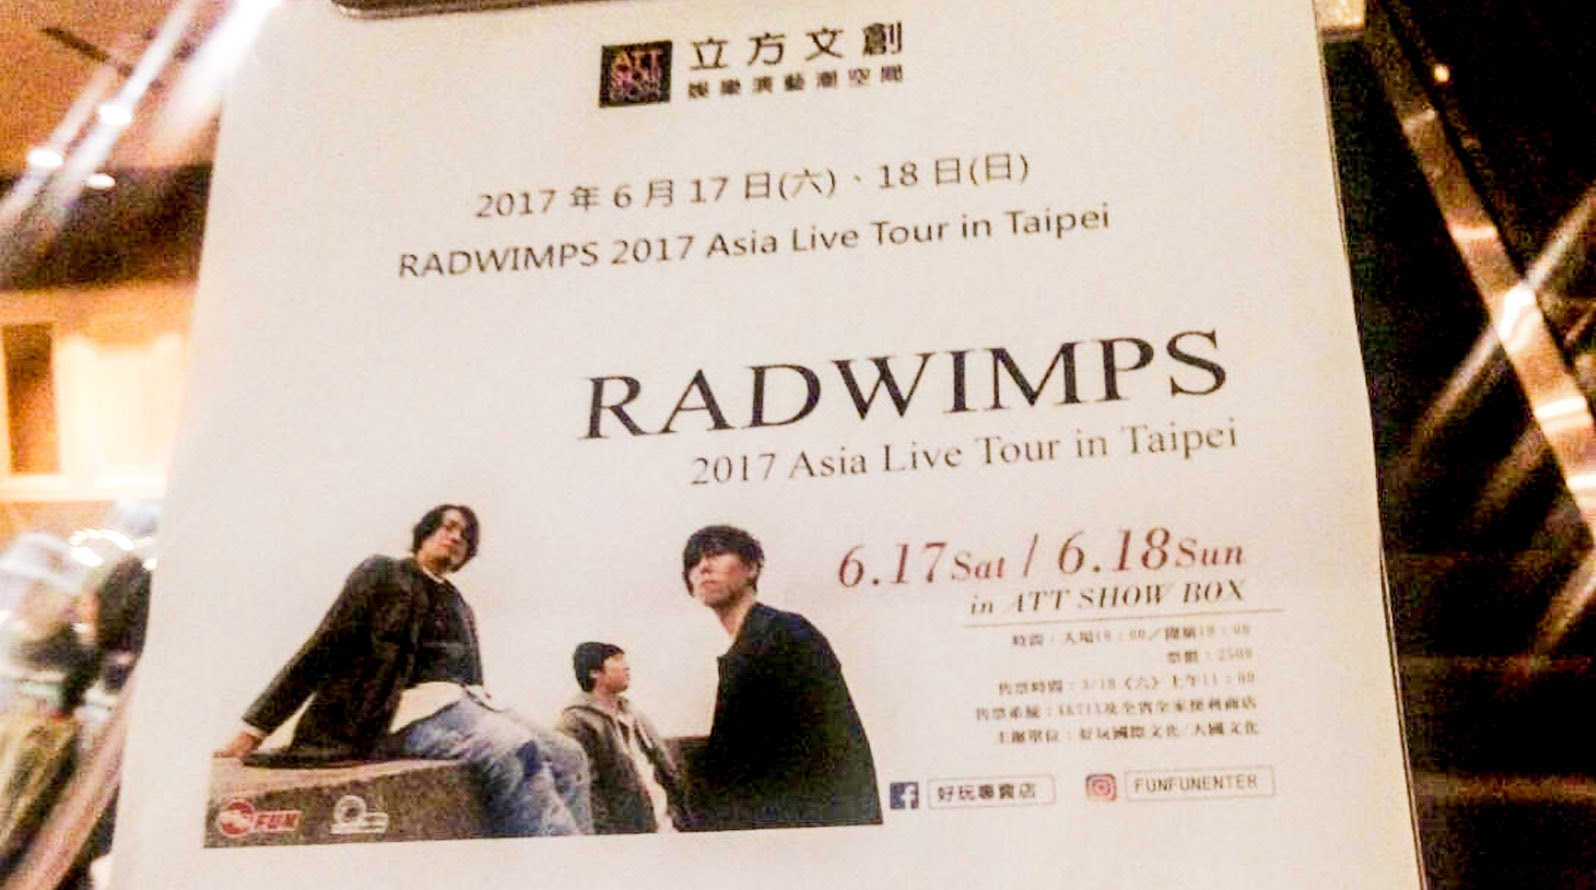 【迷迷歌單】RADWIMPS 2017 Asia Live Tour in Taipei 第二日